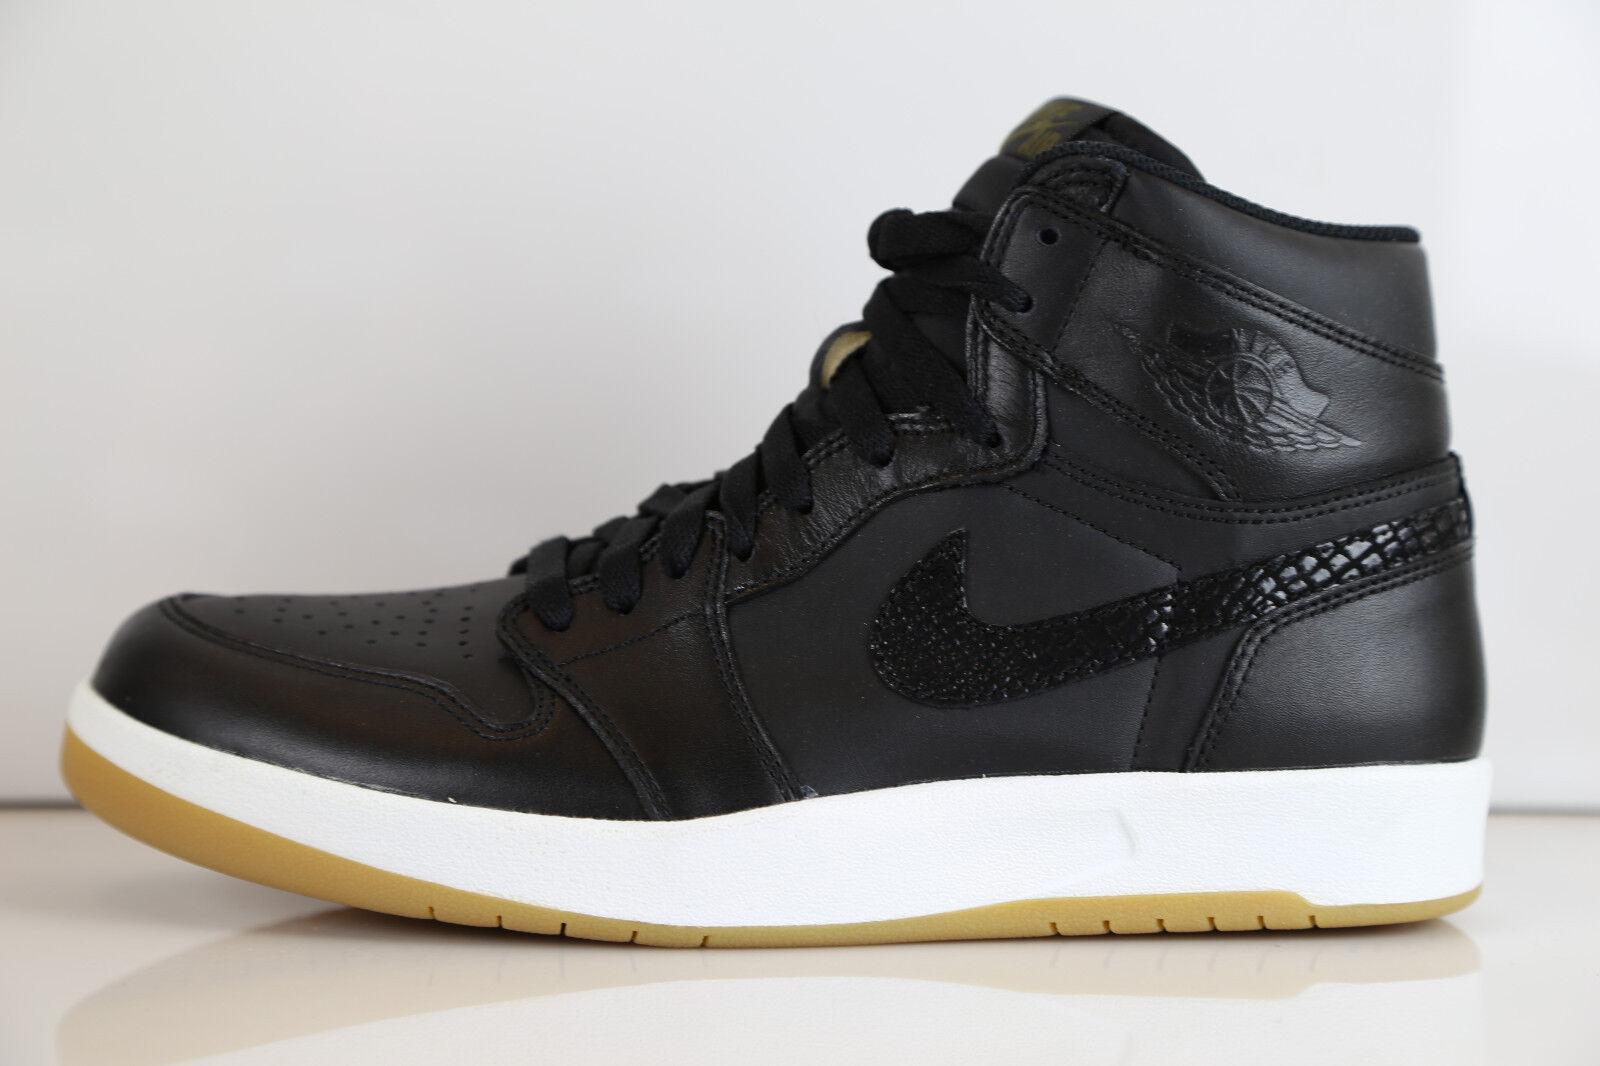 Air Jordan High The Return 1.5 Black Militia Green 768861-008 1 retro royal